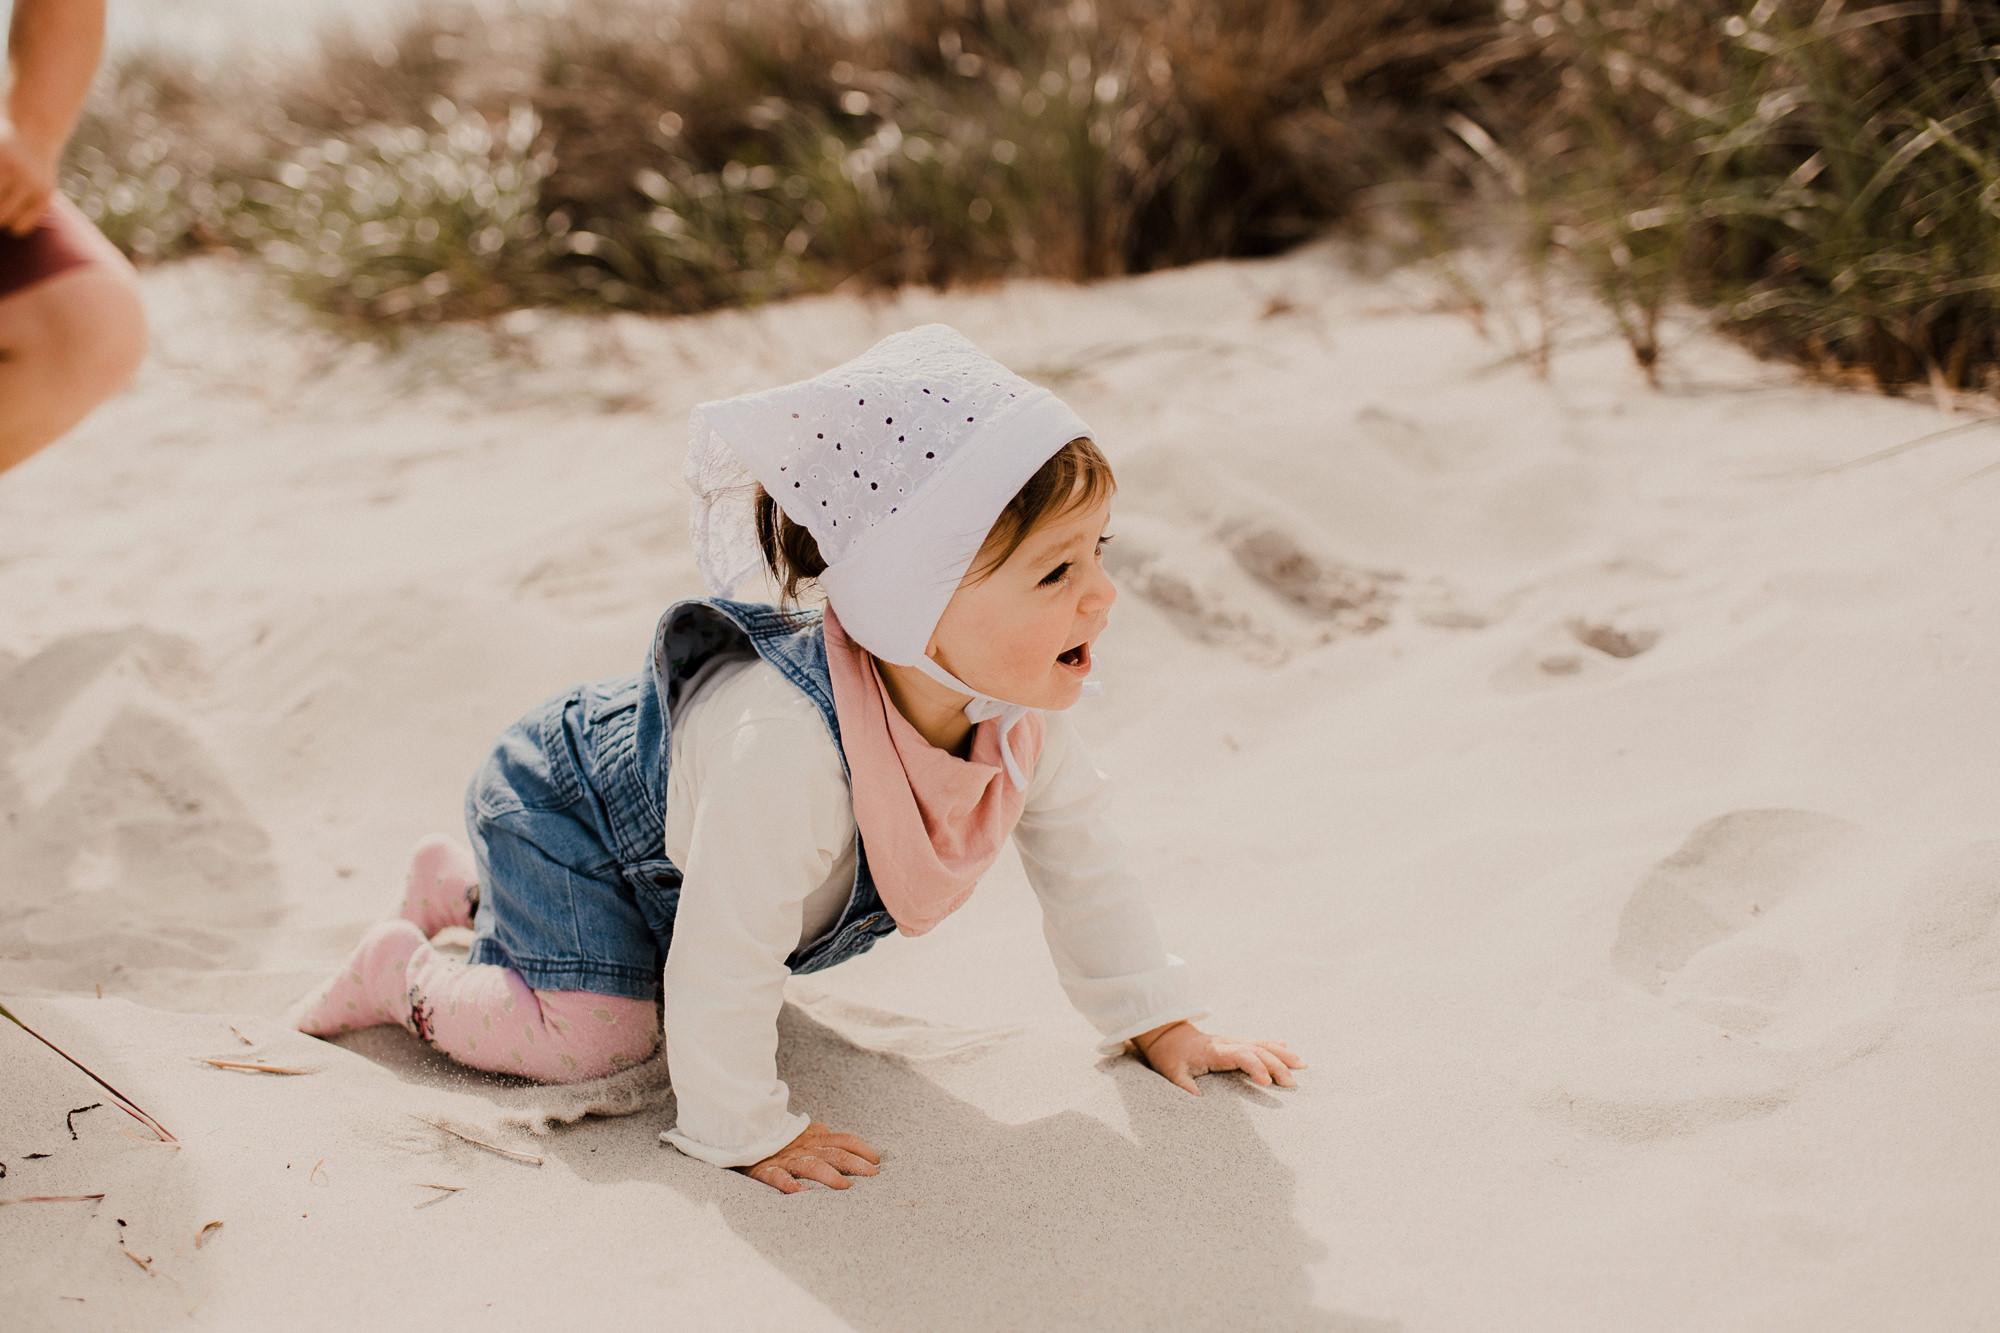 Ostseeurlaub - Warnemünde - Fotograf - Graal Müritz - Familienfotografie - Zingst - Familie - Babyfotografie